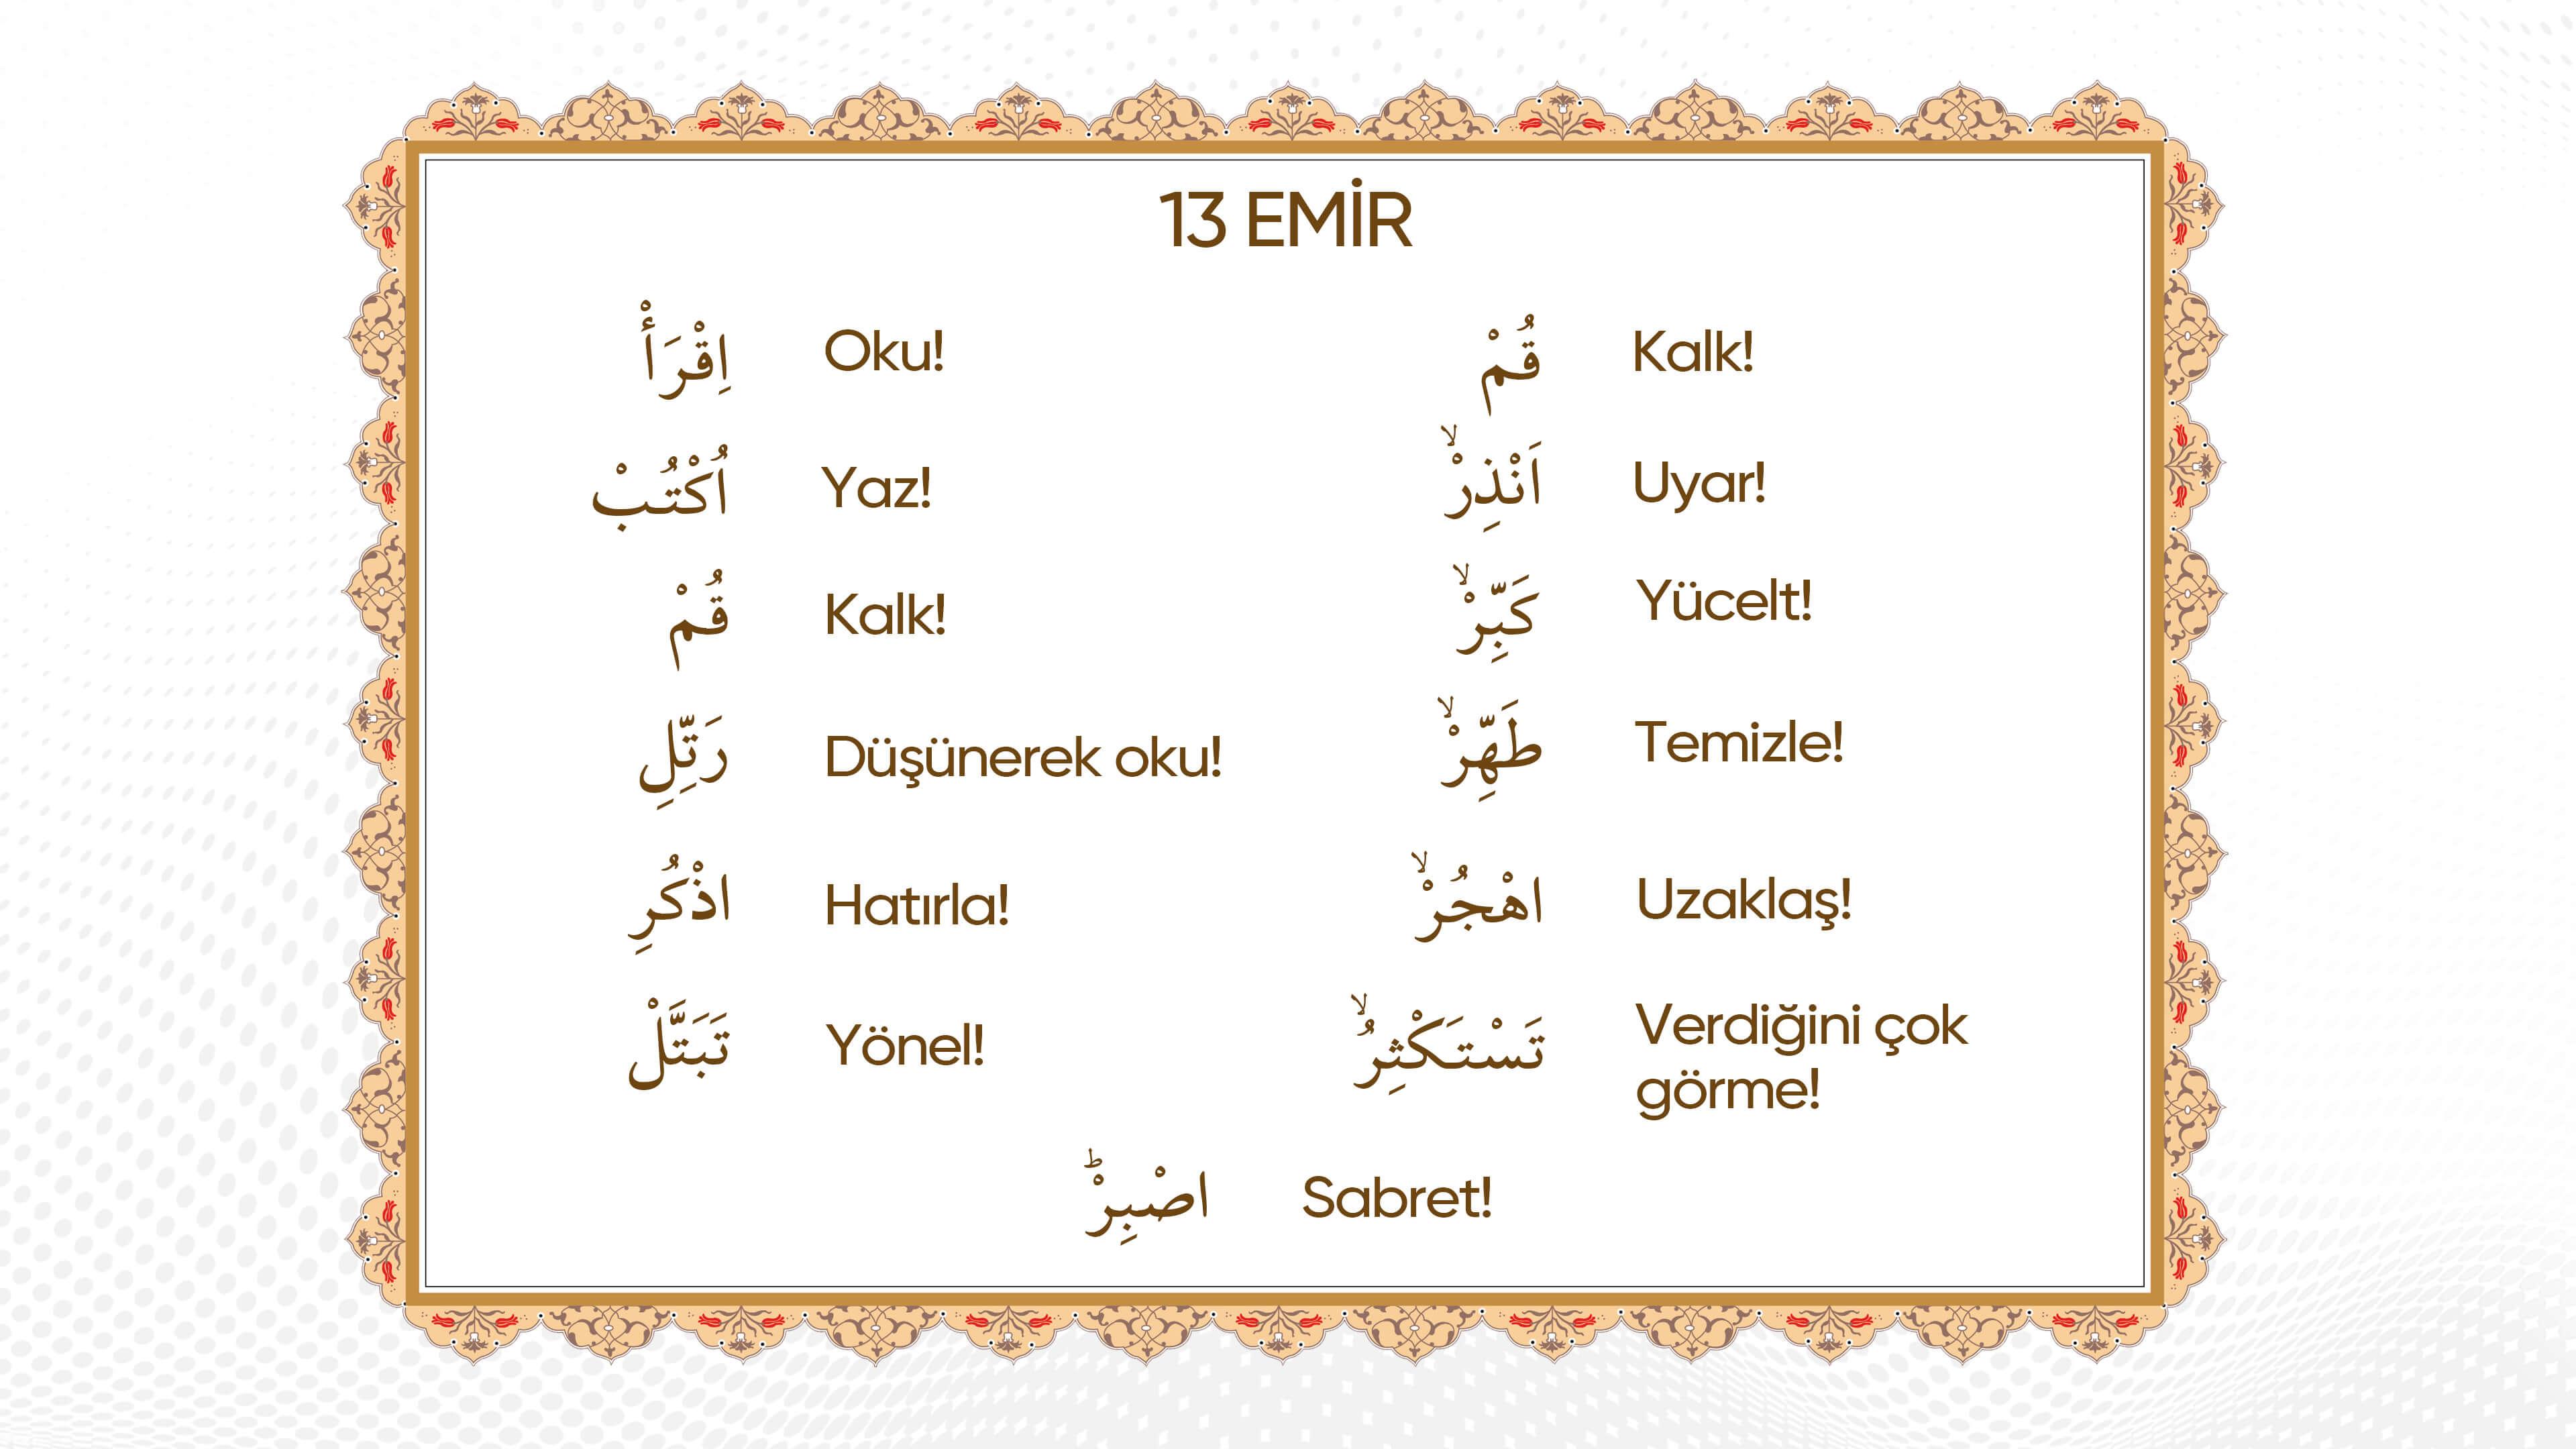 13 Emir